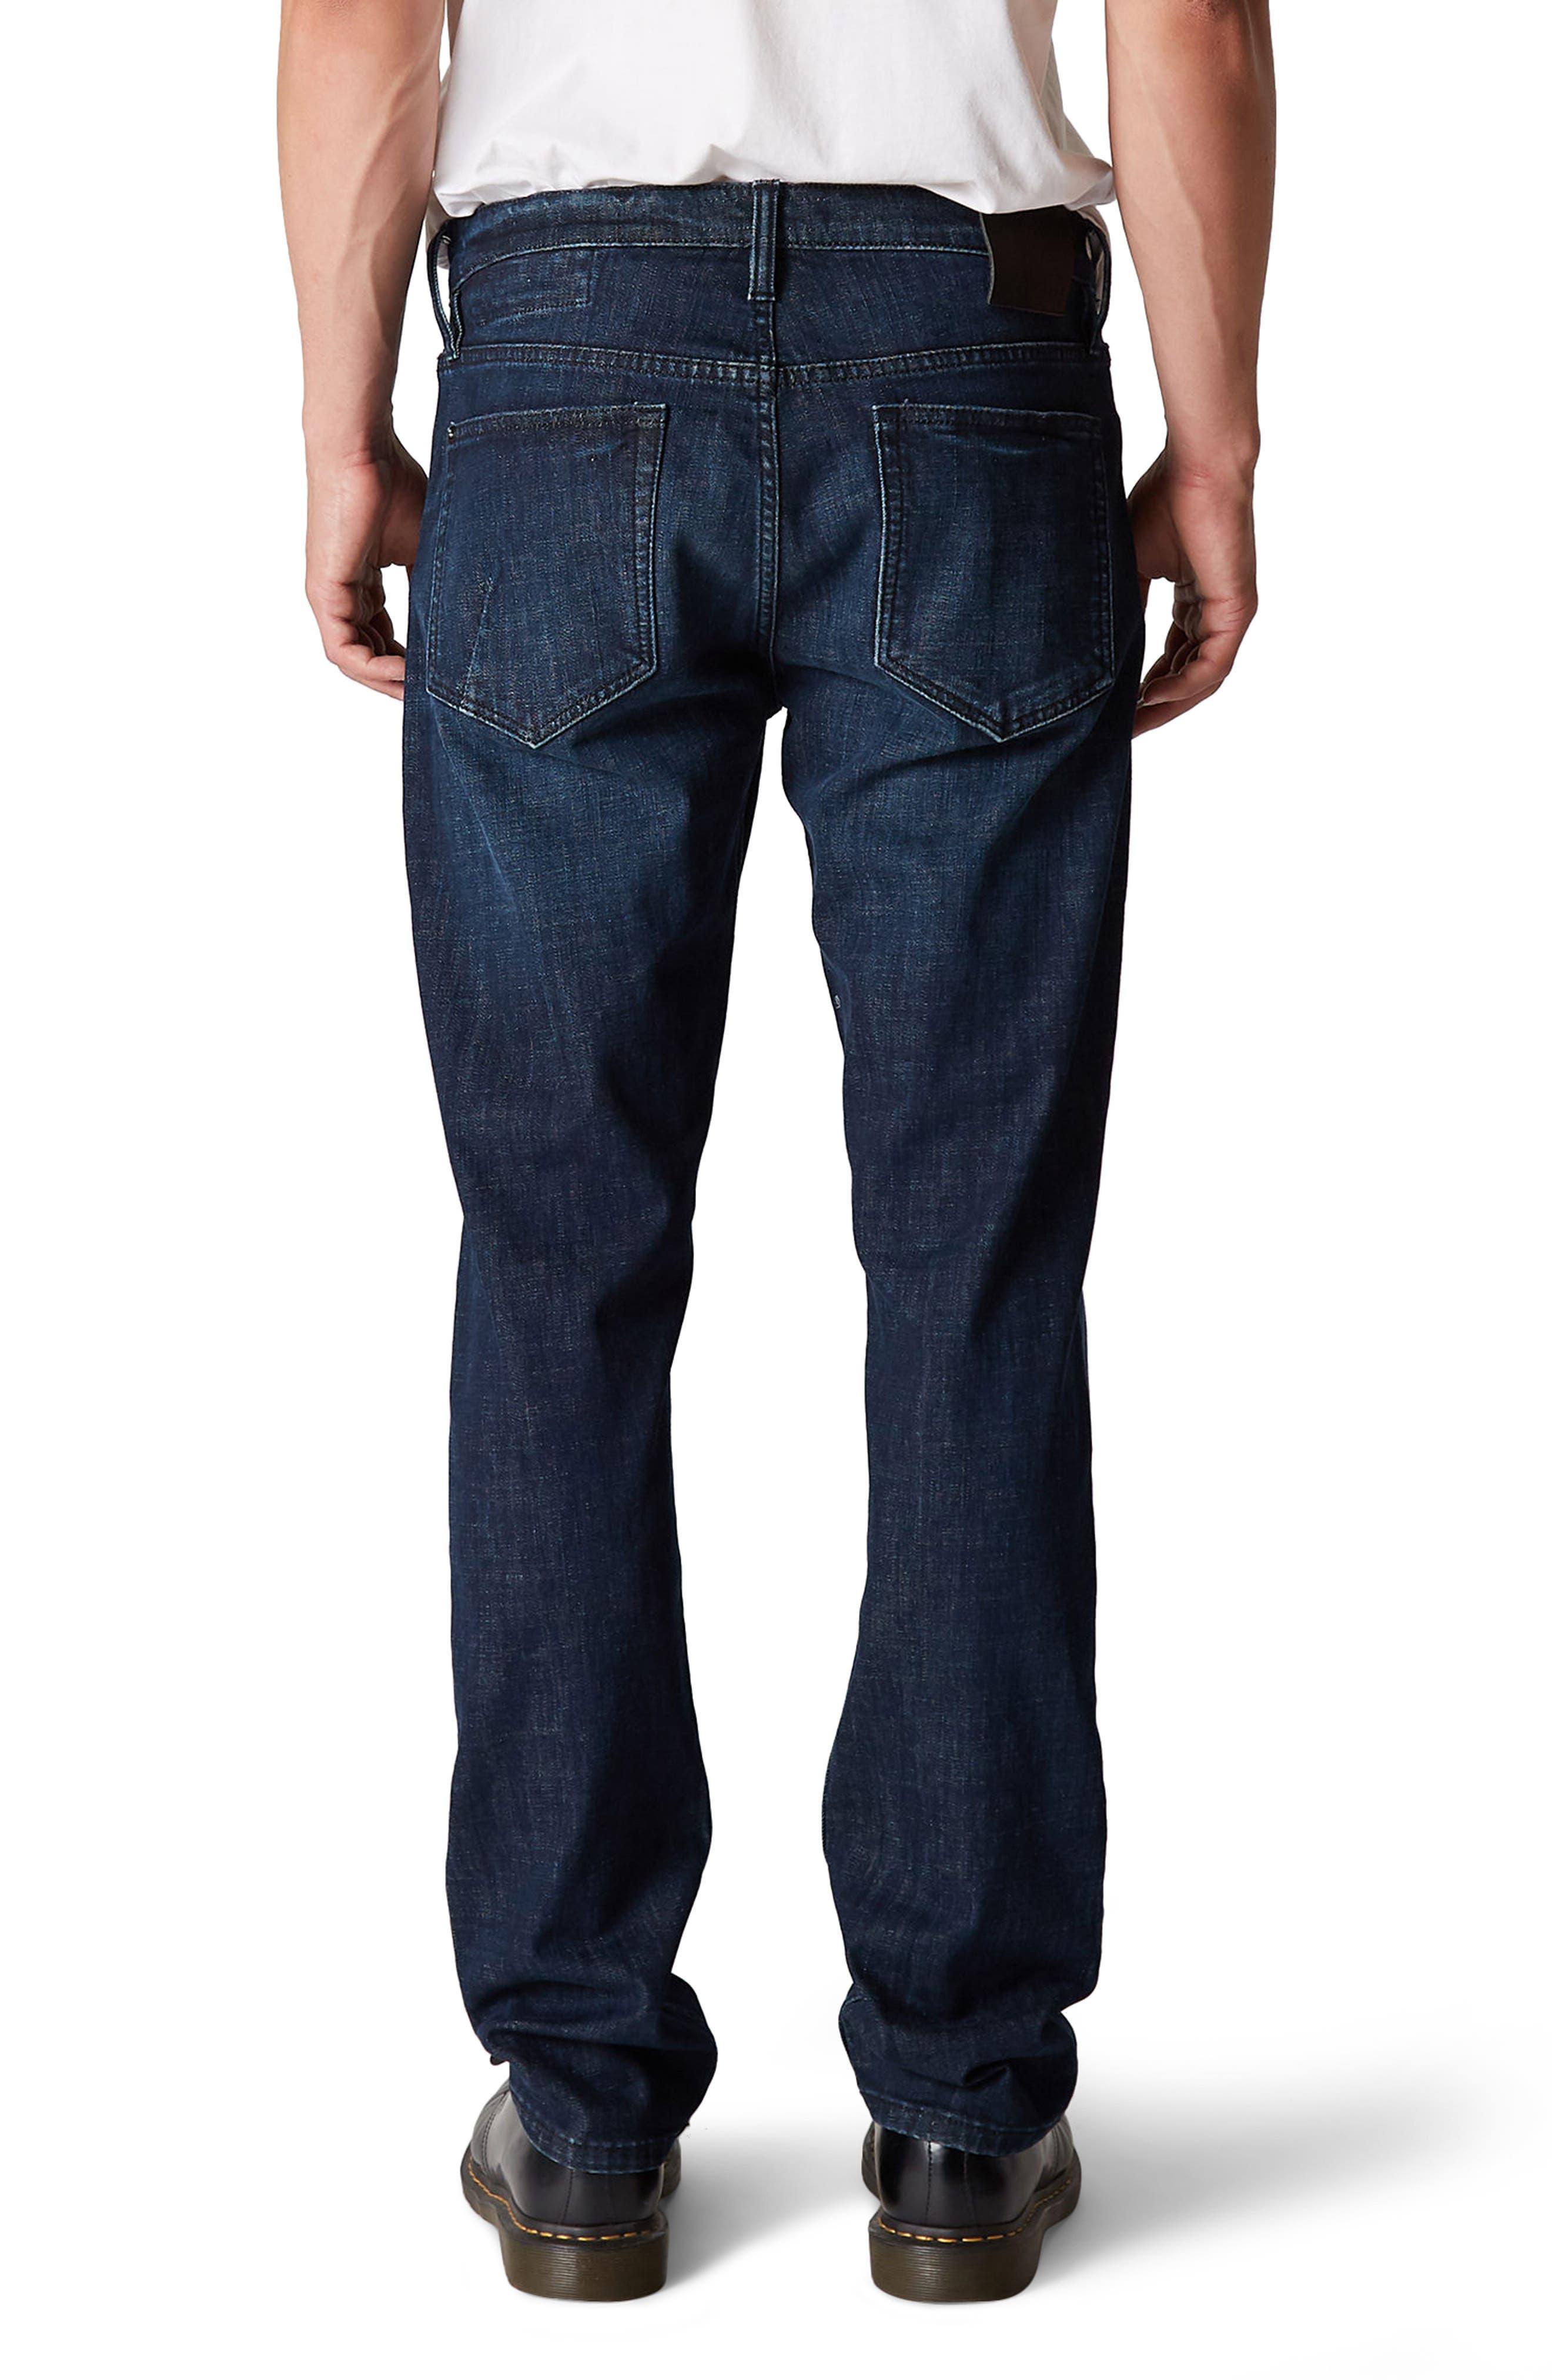 Wooster Slim Fit Jeans,                             Alternate thumbnail 2, color,                             Ten Strikes